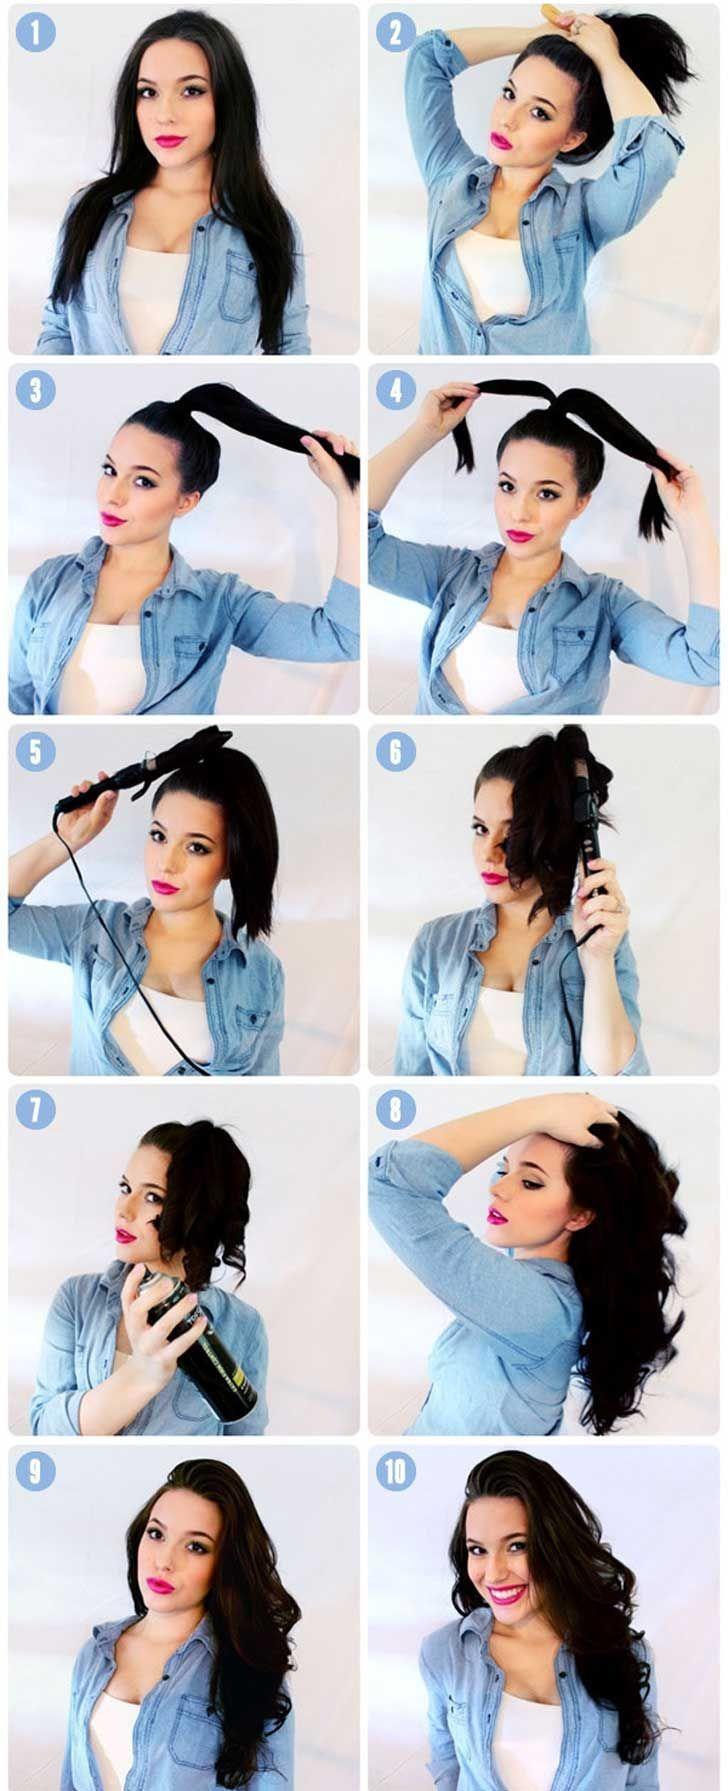 47 trucos de belleza que toda mujer práctica debe saber | Upsocl